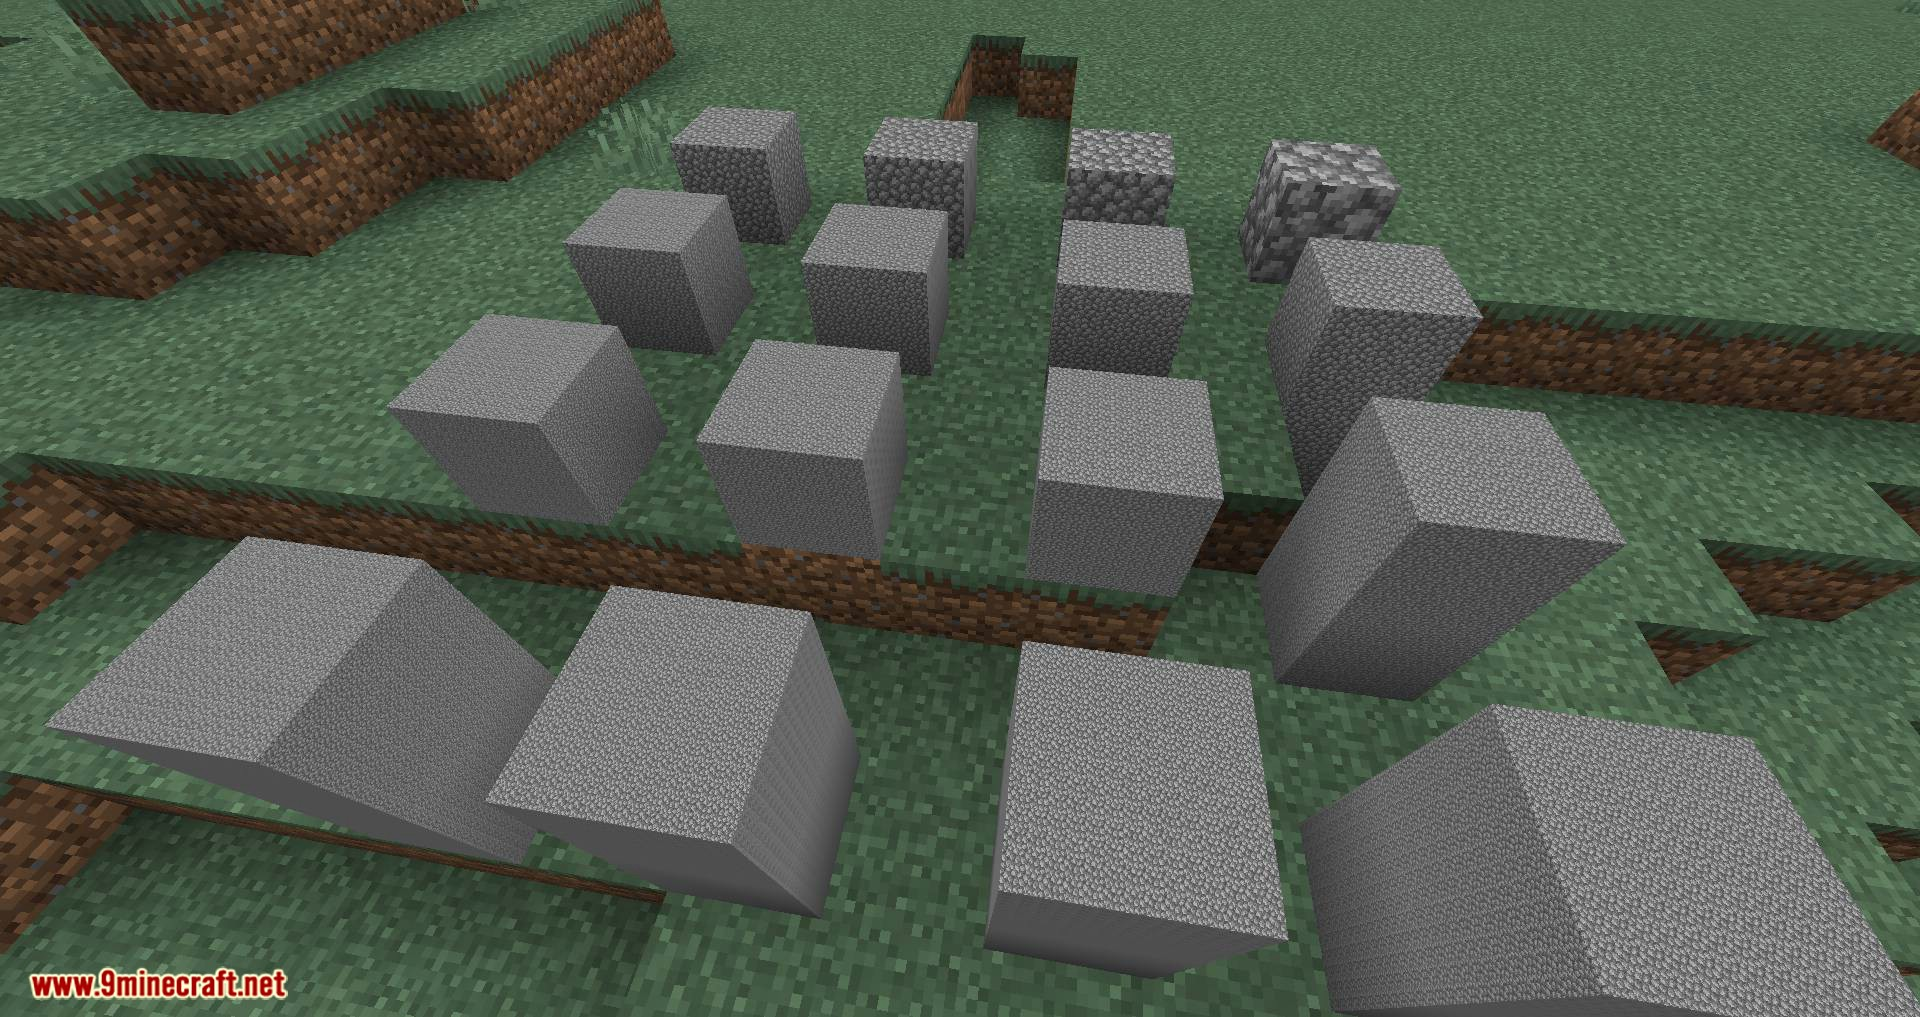 Overloaded Compressed Blocks mod for minecraft 04